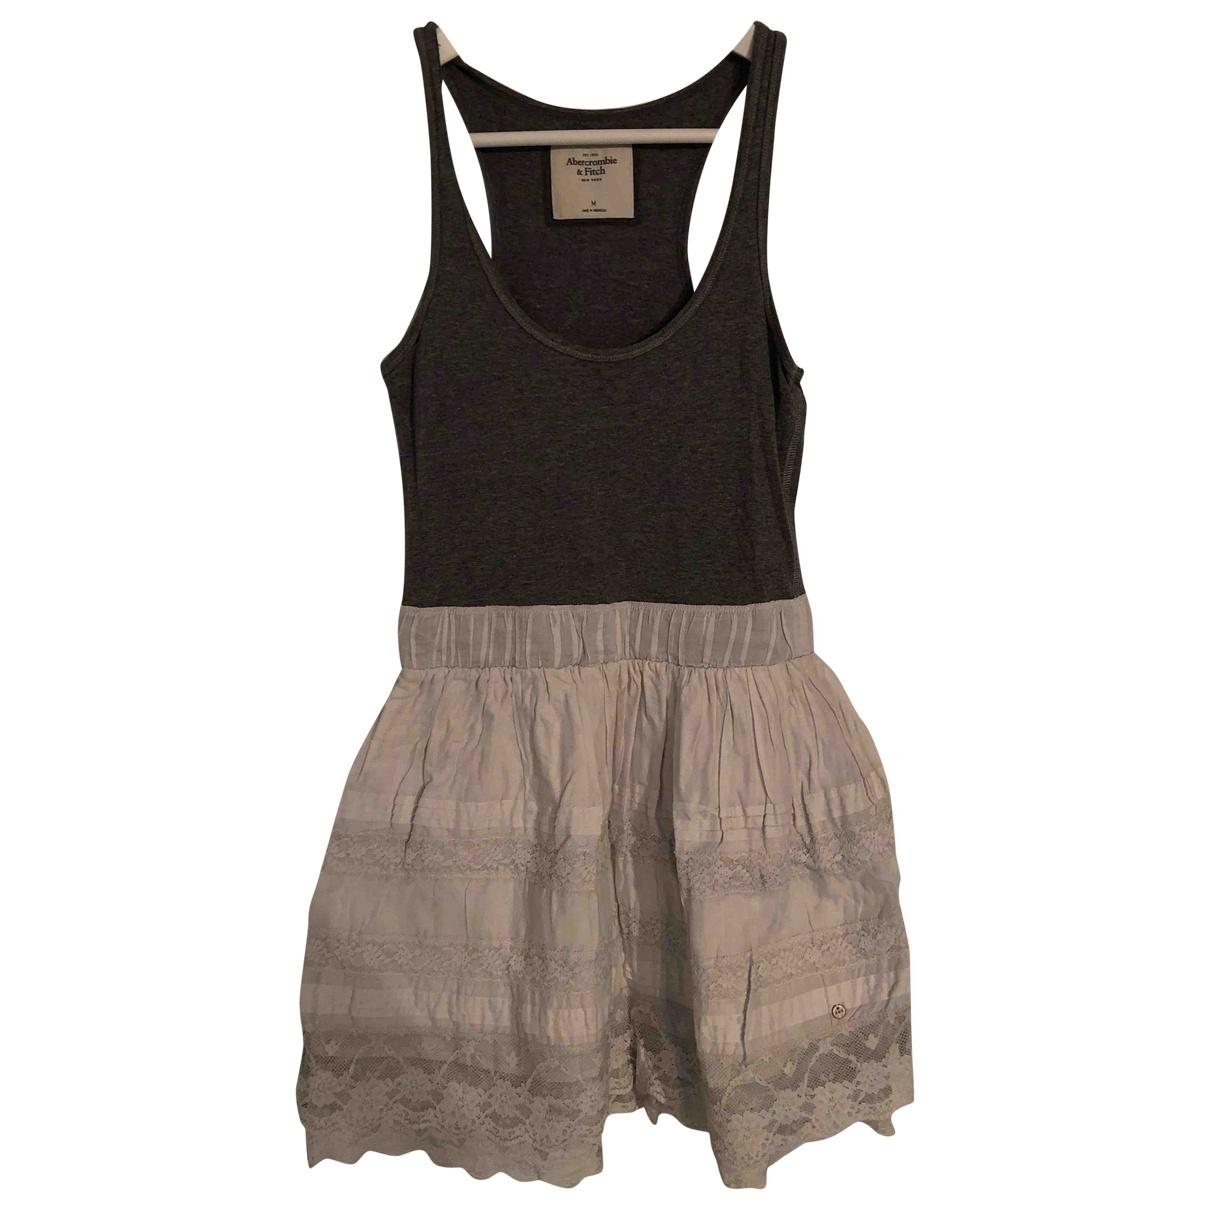 Abercrombie & Fitch \N Grey Cotton - elasthane dress for Women M International